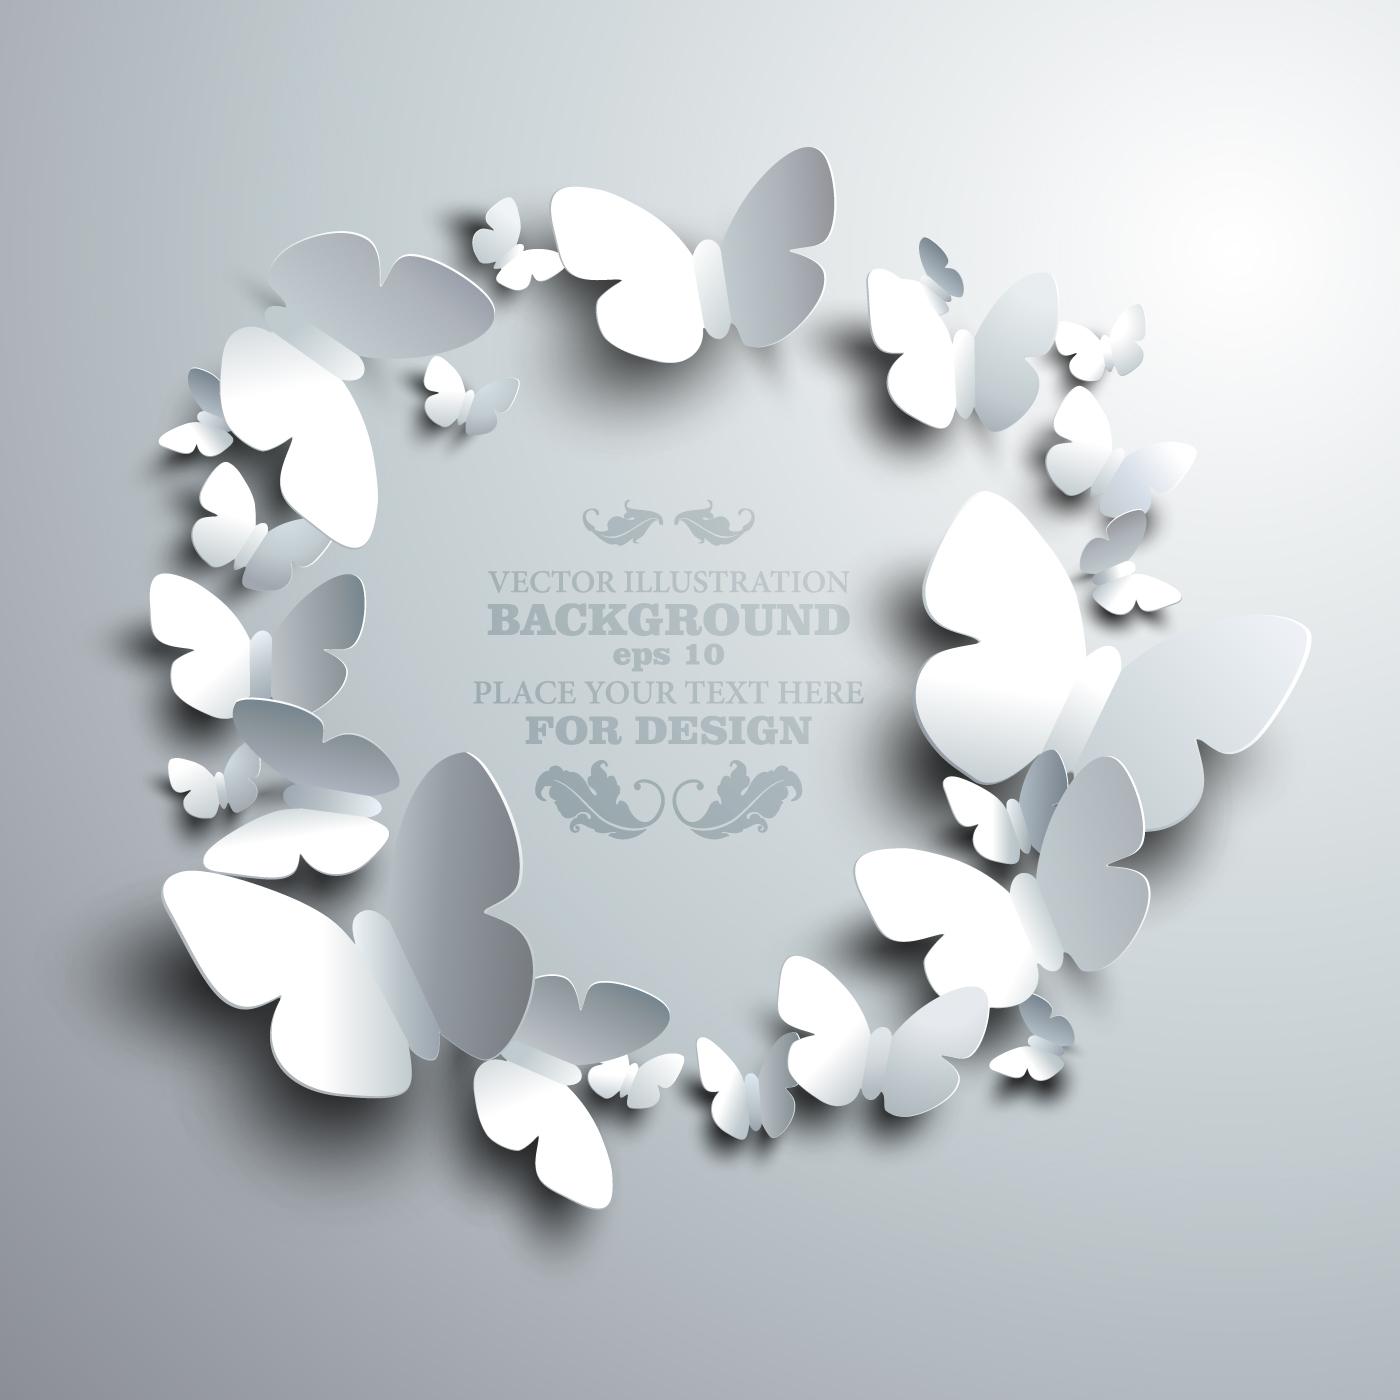 Paper butterflies vector backgrounds 01 free download - photo#13